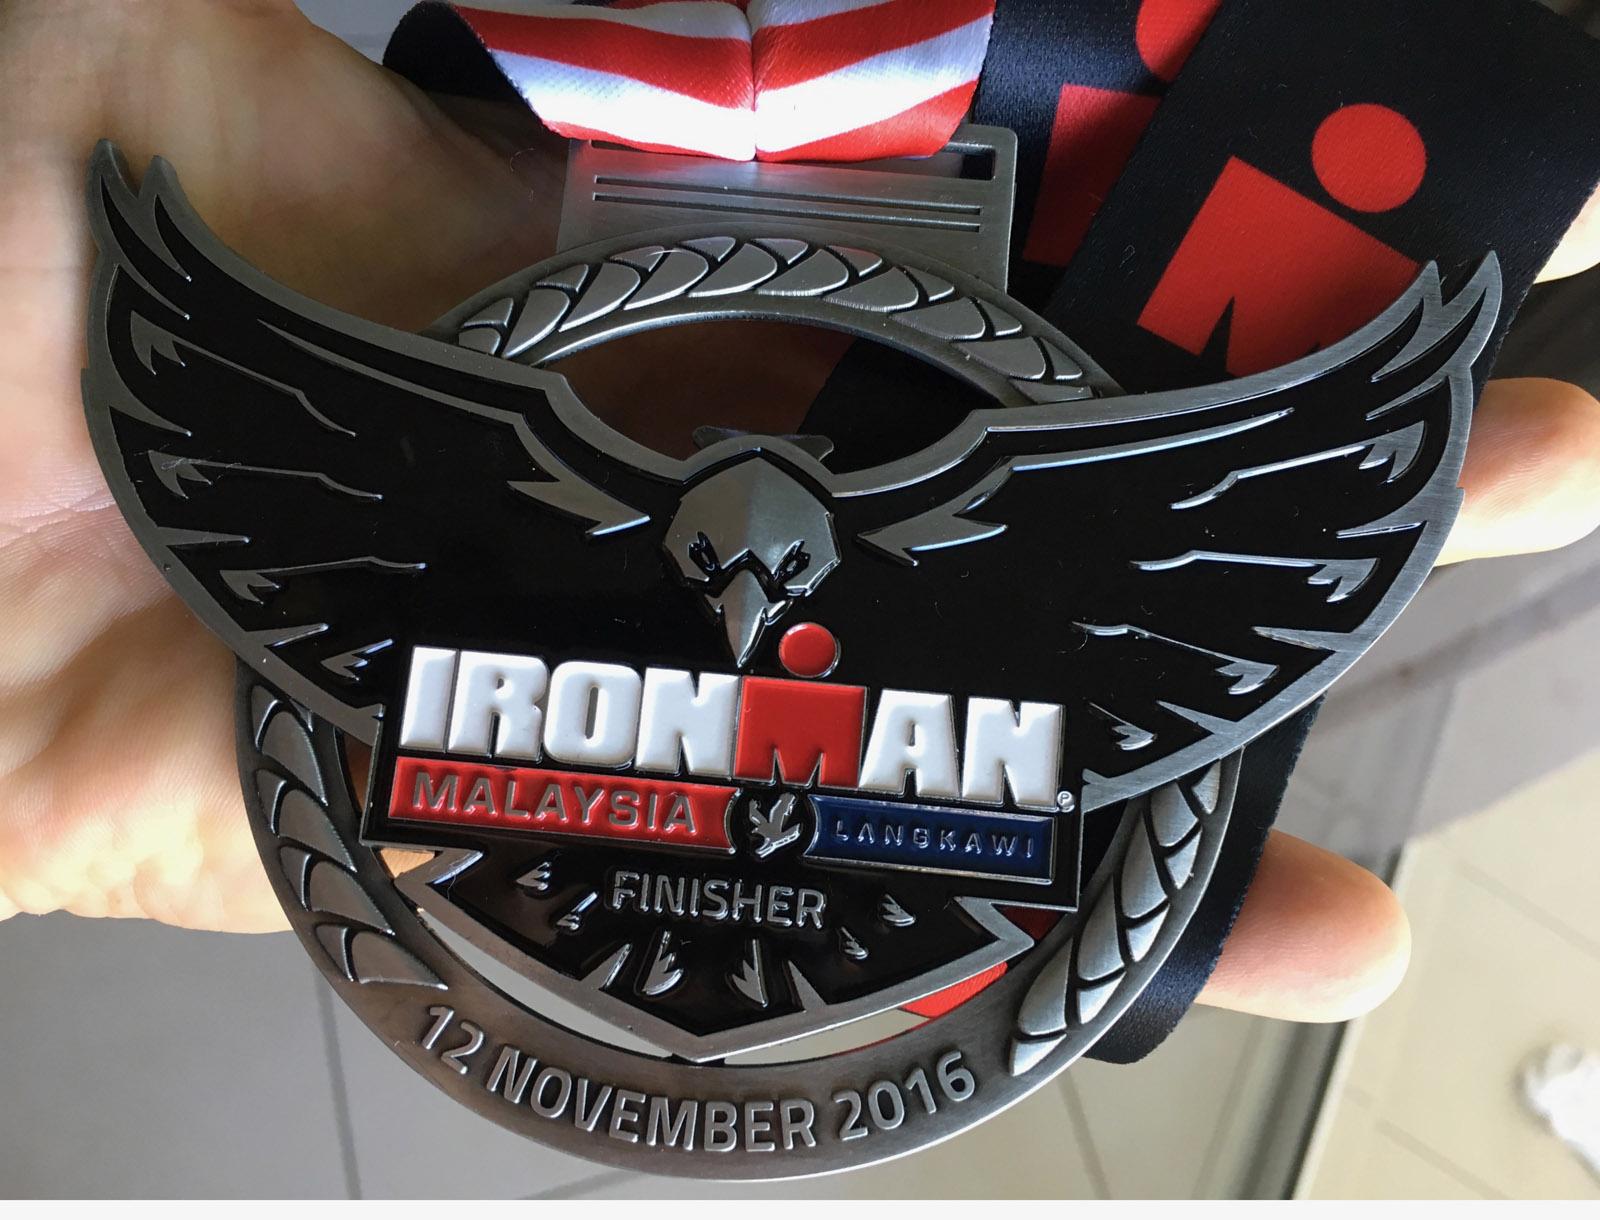 Finisher de l'Ironman de Langkawi